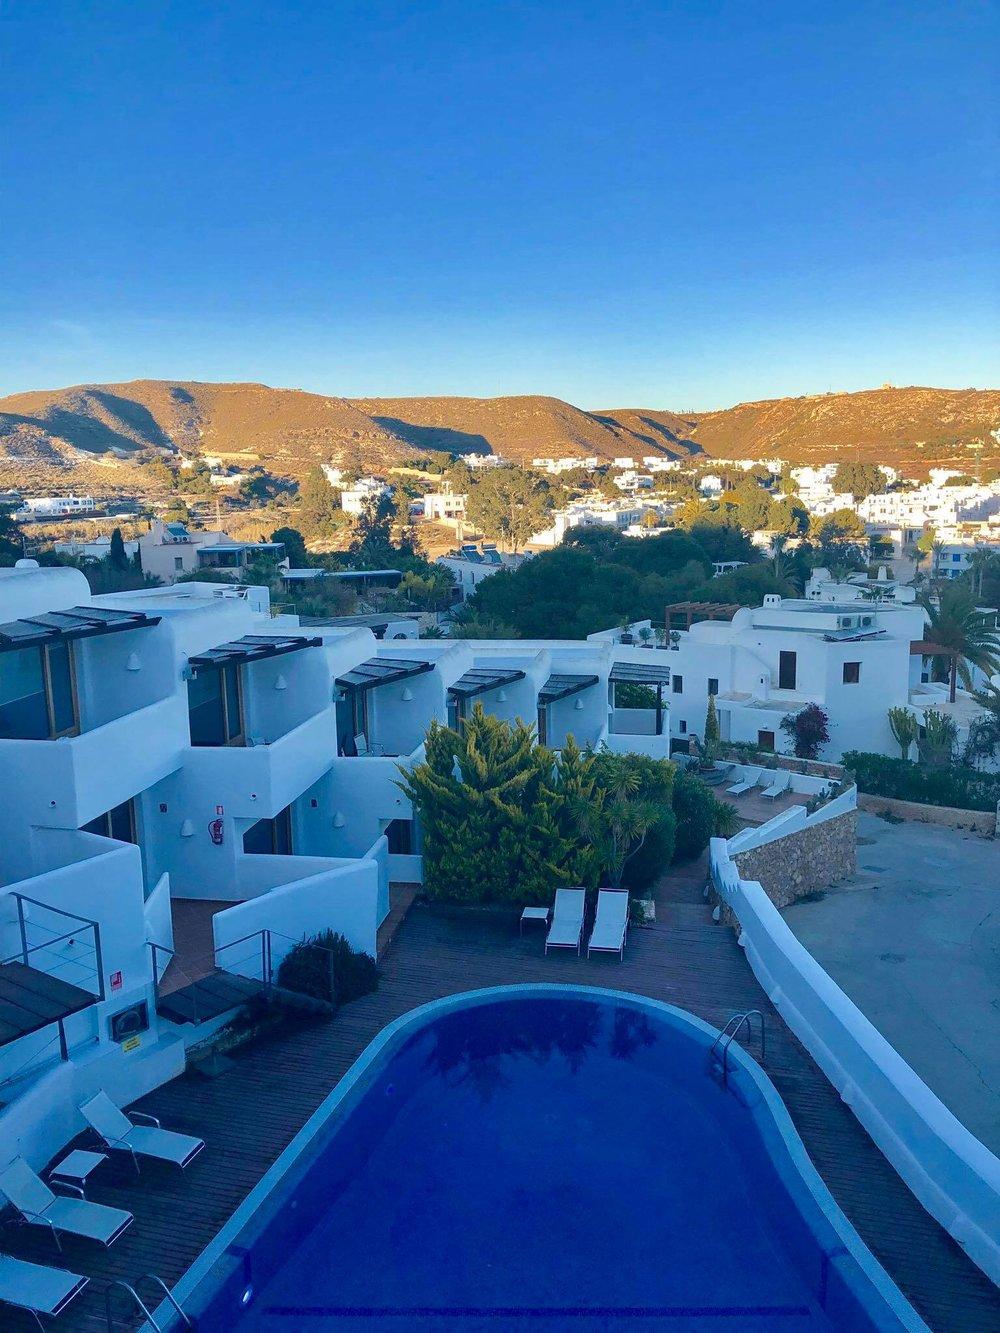 Kach Solo Travels in 2019 Spain you're so beautiful24.jpg